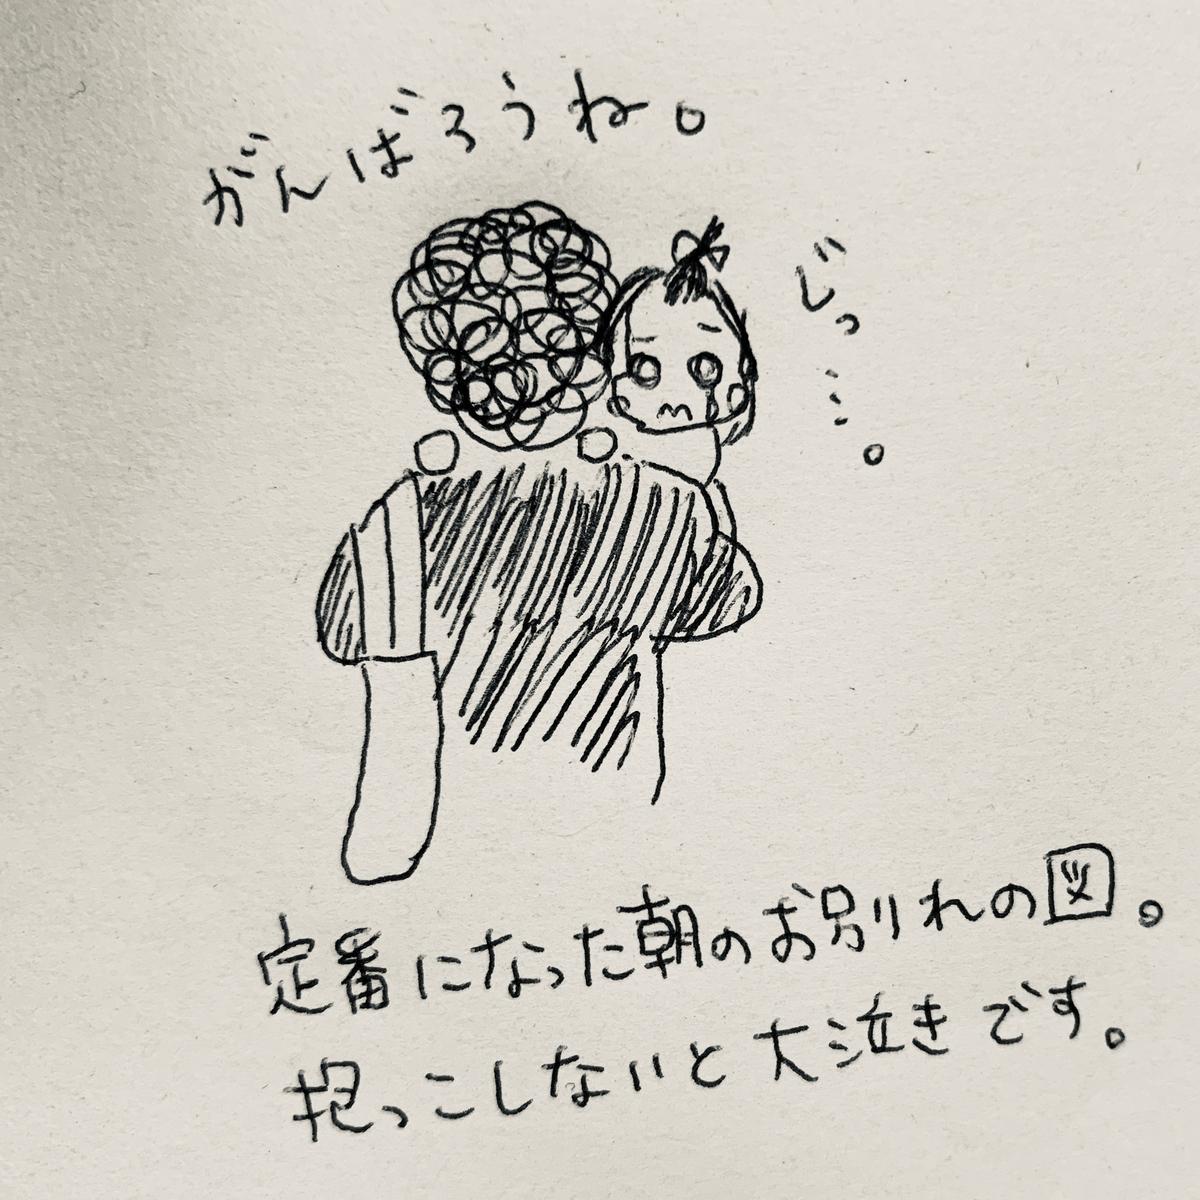 f:id:nananan0:20190412103450j:plain